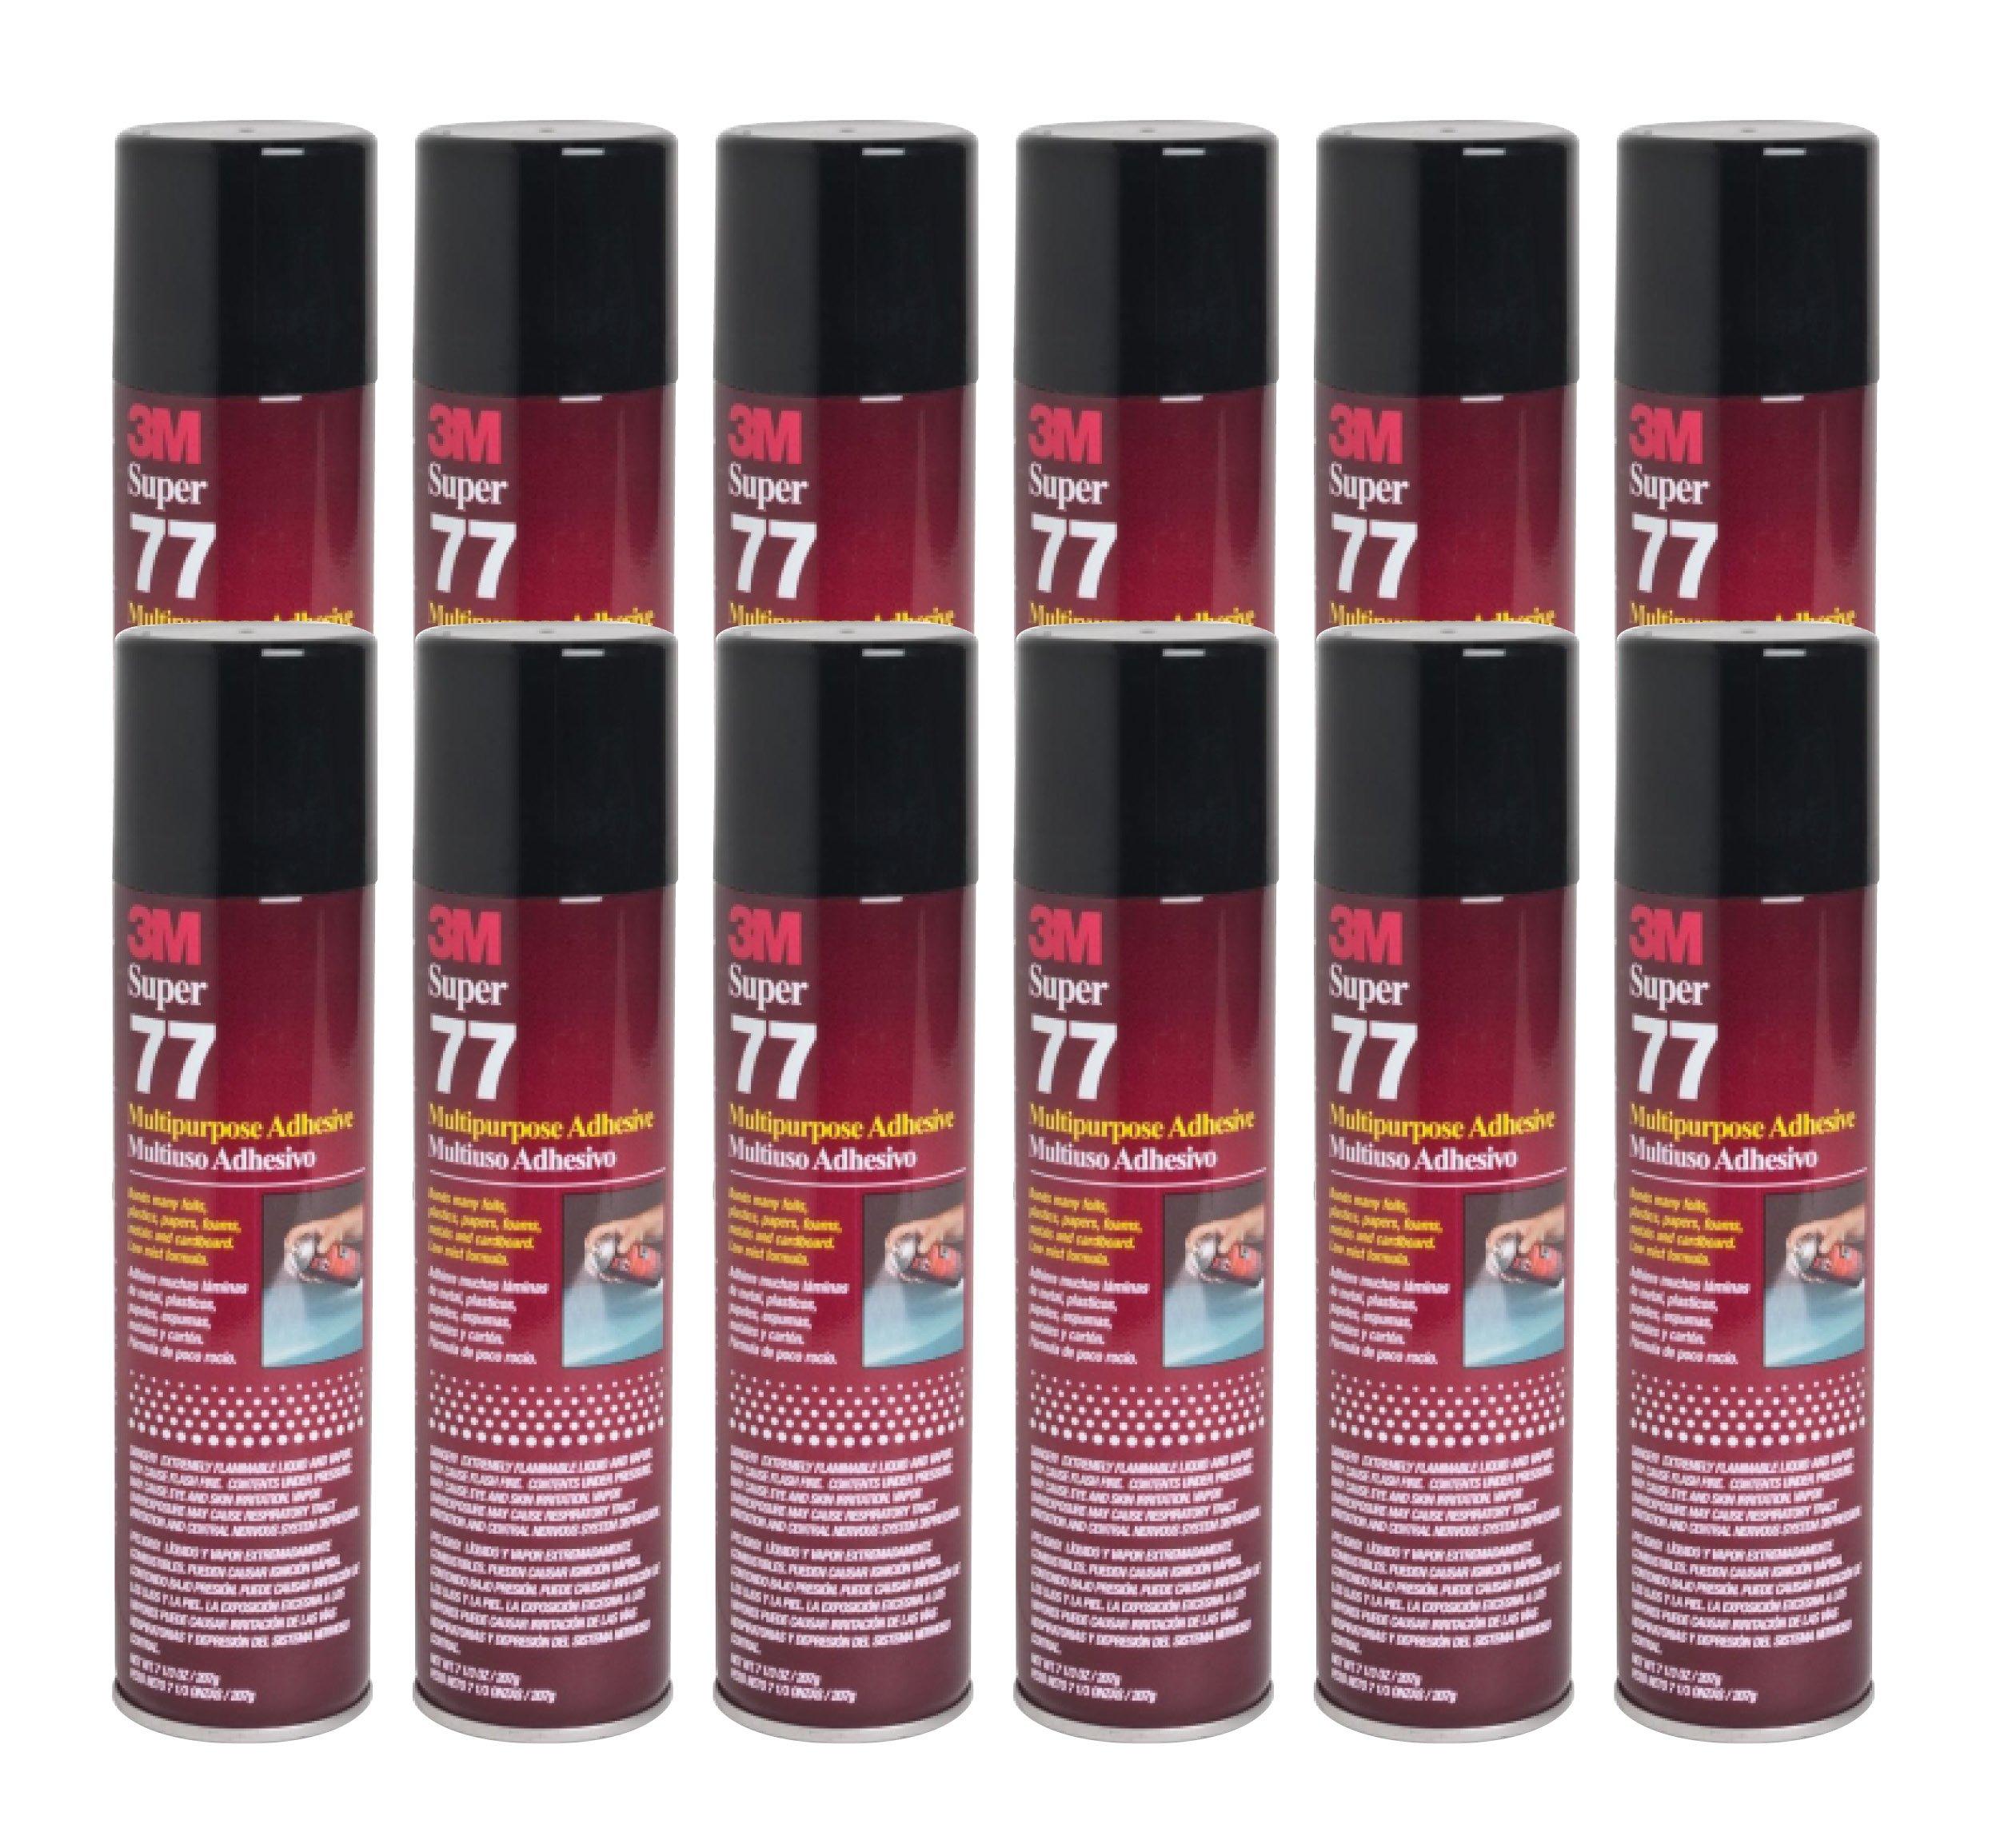 QTY12 3M SUPER 77 7.3 OZ SPRAY GLUE CAN MULTIPURPOSE ADHESIVE by 3M SUPER 77